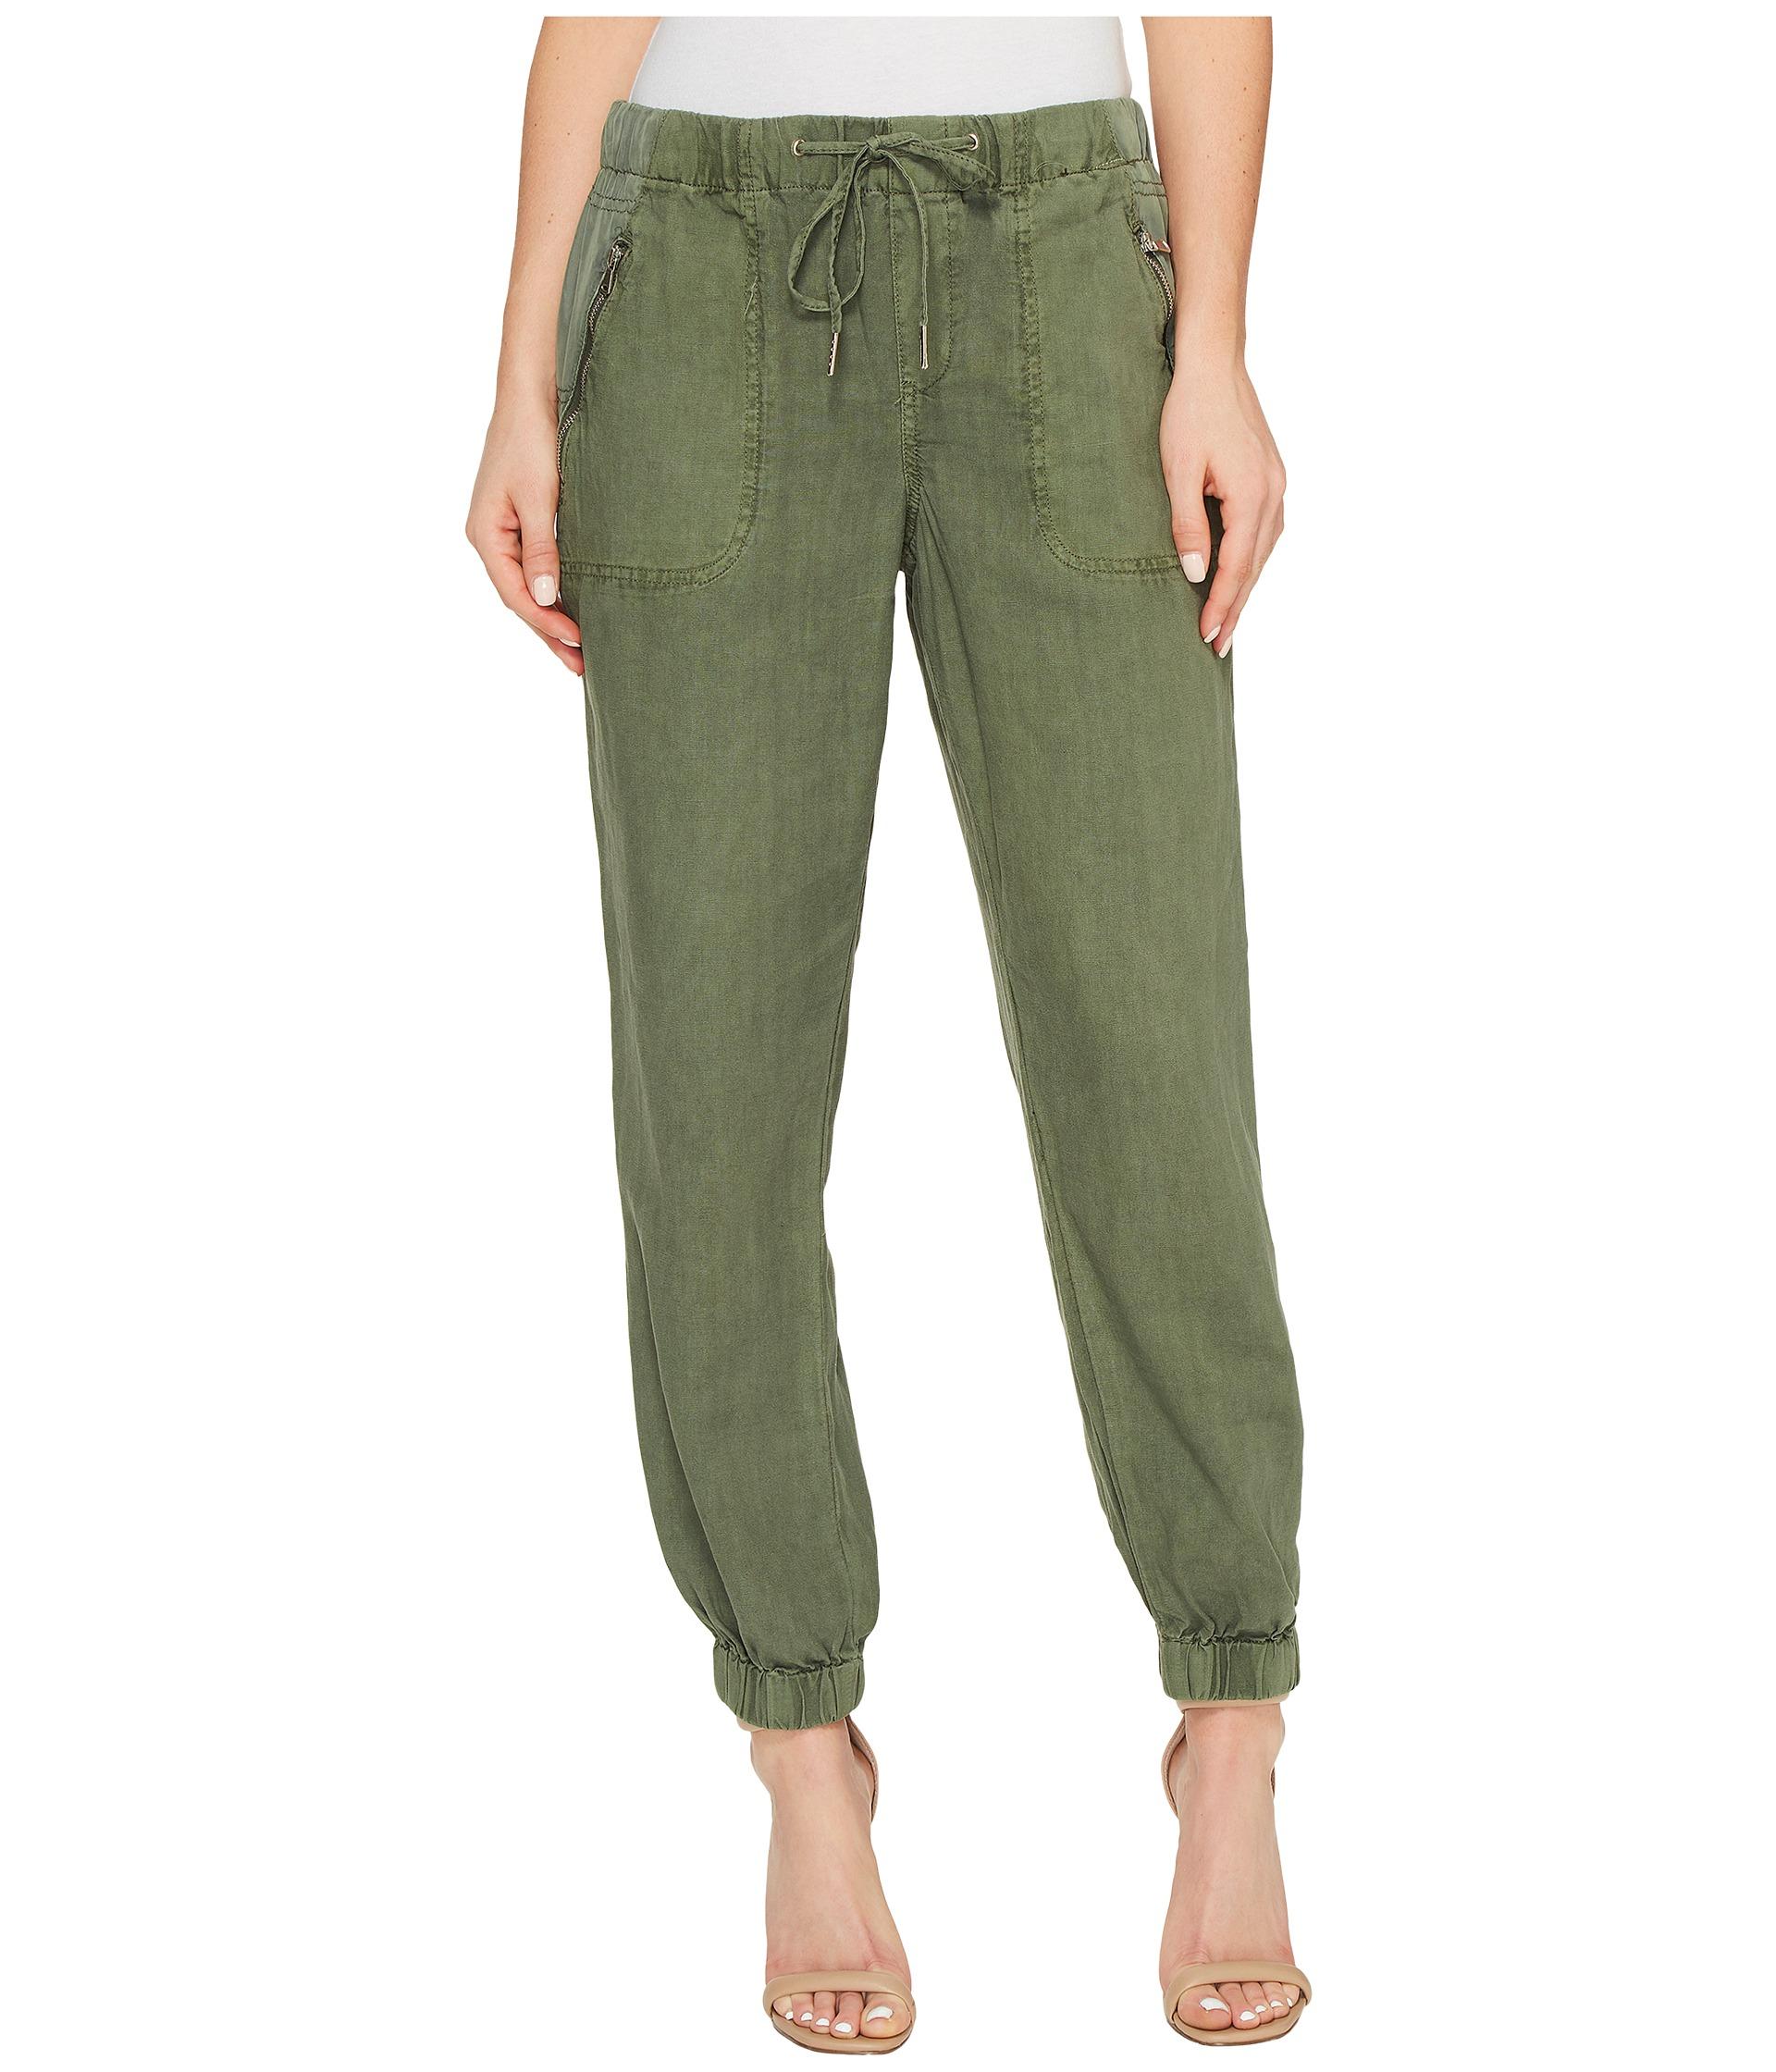 Pants, Linen, Women | Shipped Free at Zappos